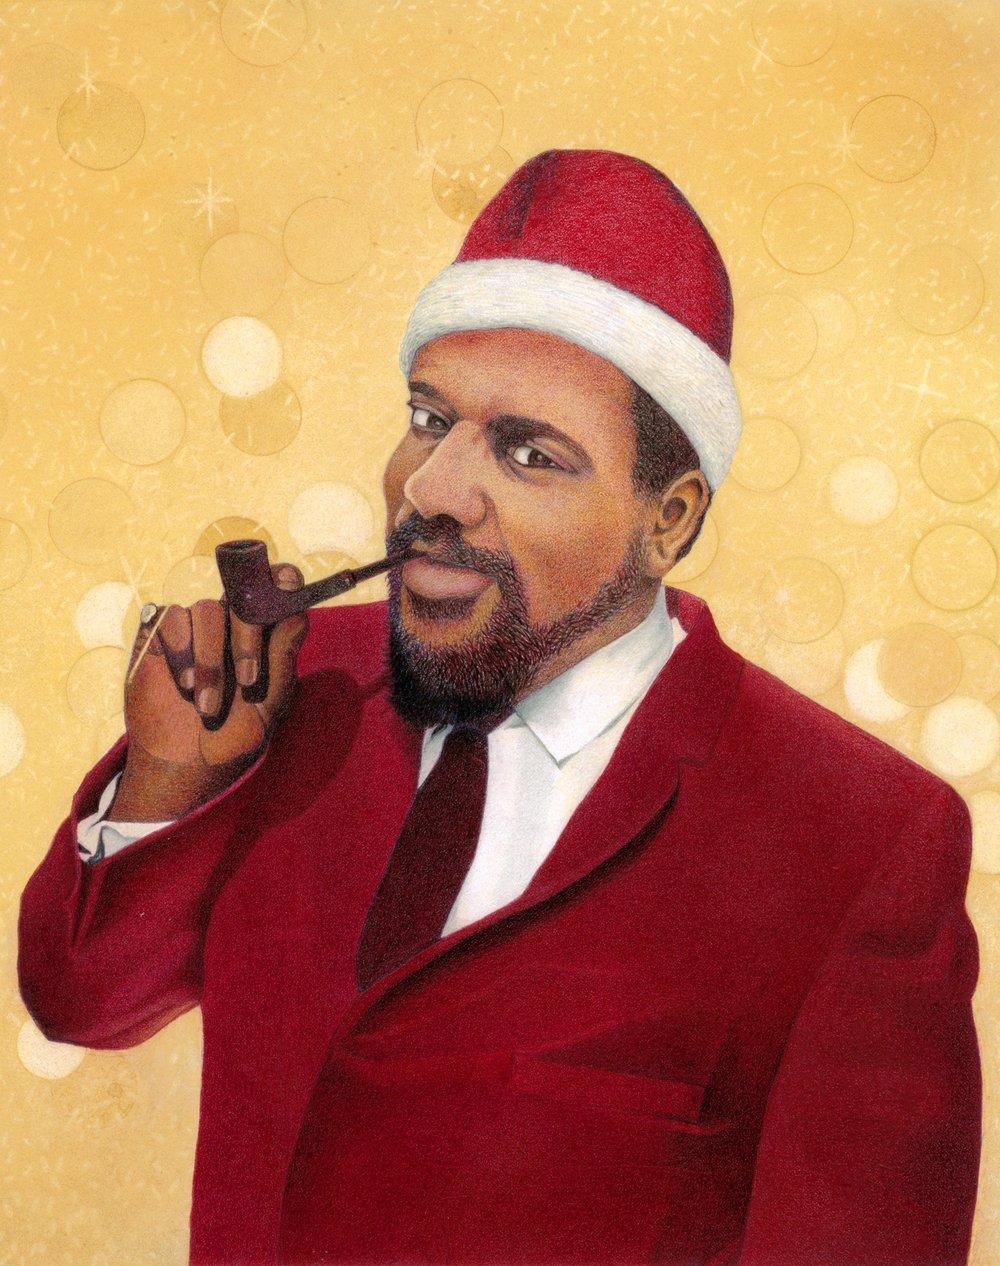 Santa Monk Kuumbwa Christmas Card